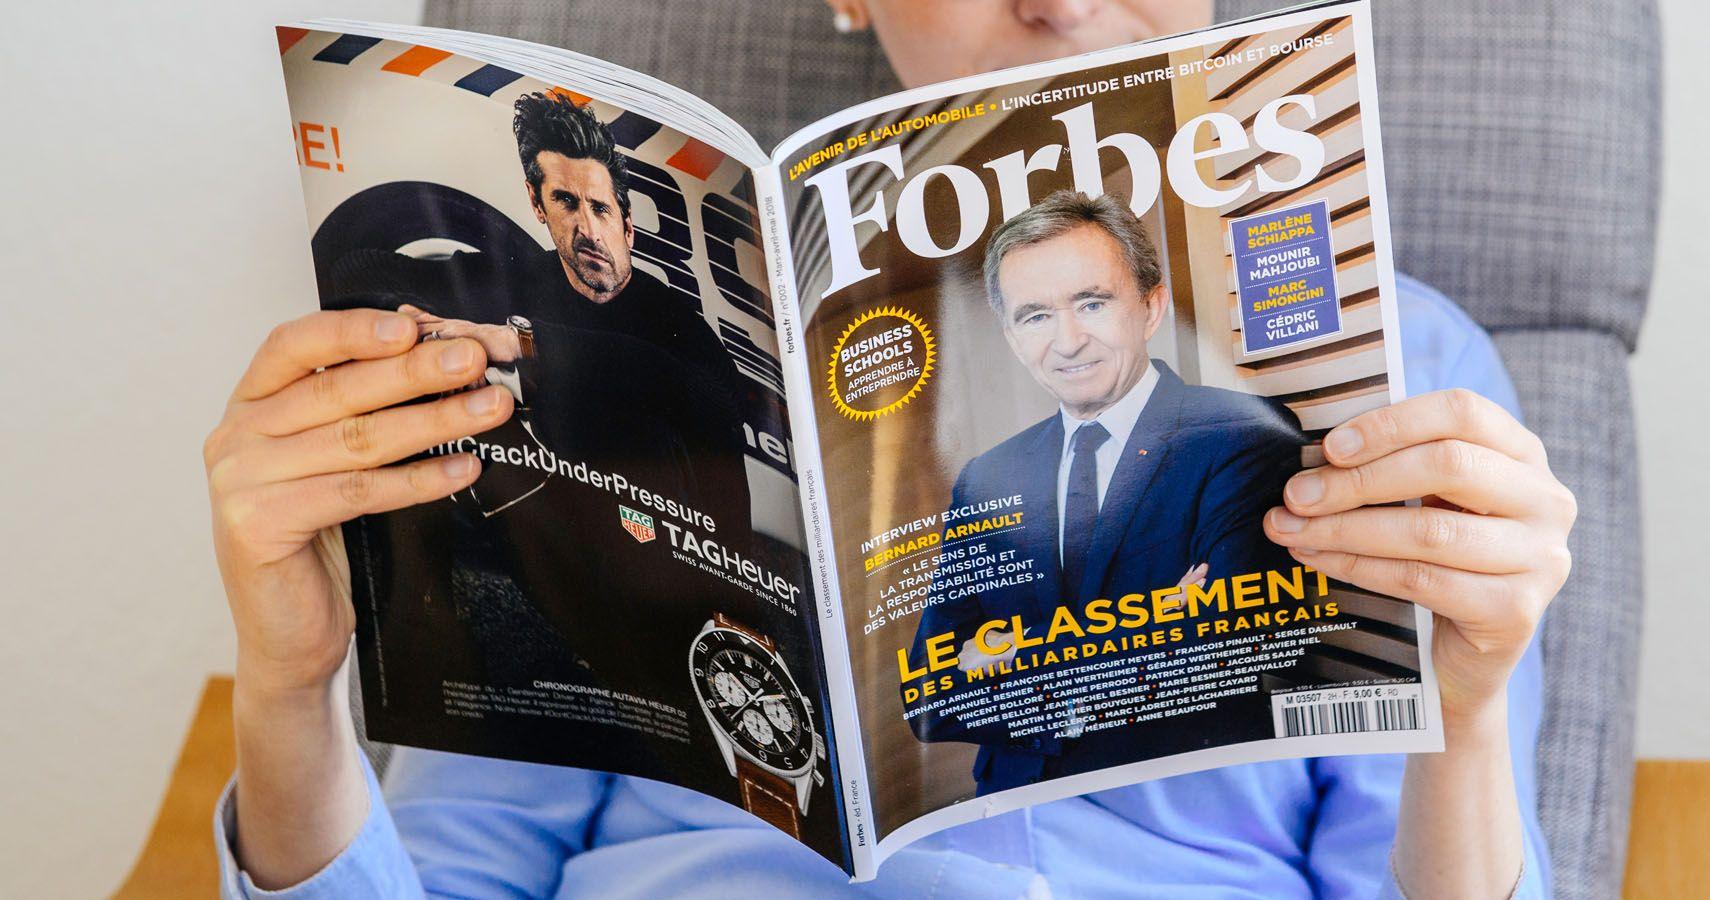 Bernard Arnault Takes Elon Musk's Spot For Second Richest Man In The World